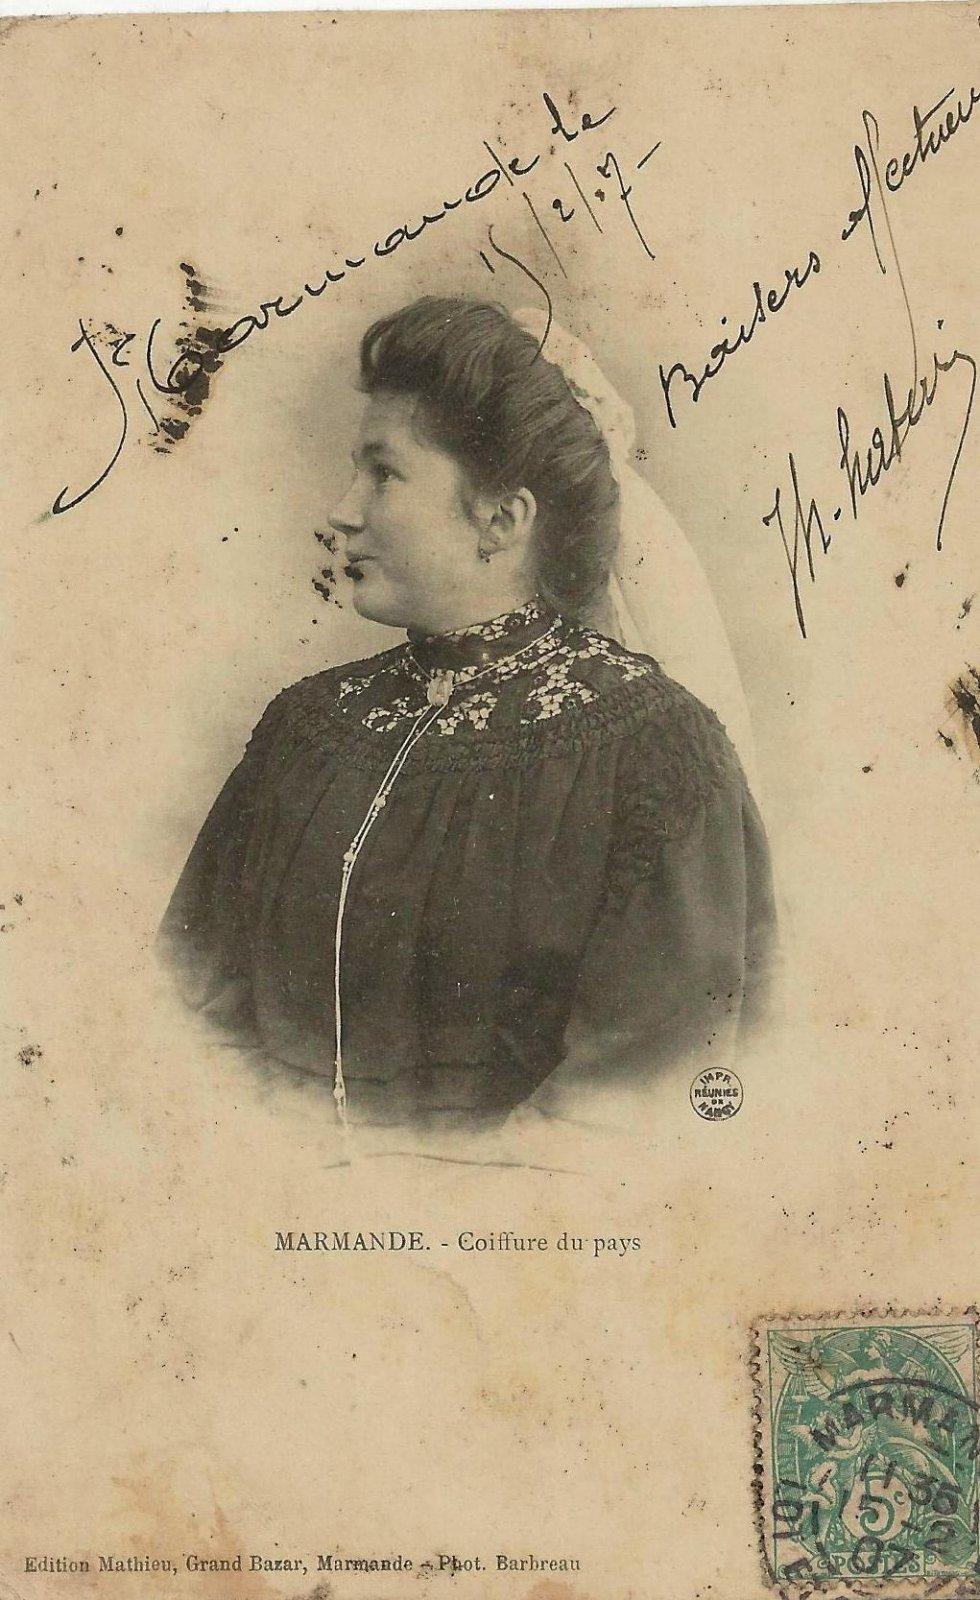 marmande coiffure du pays 1907